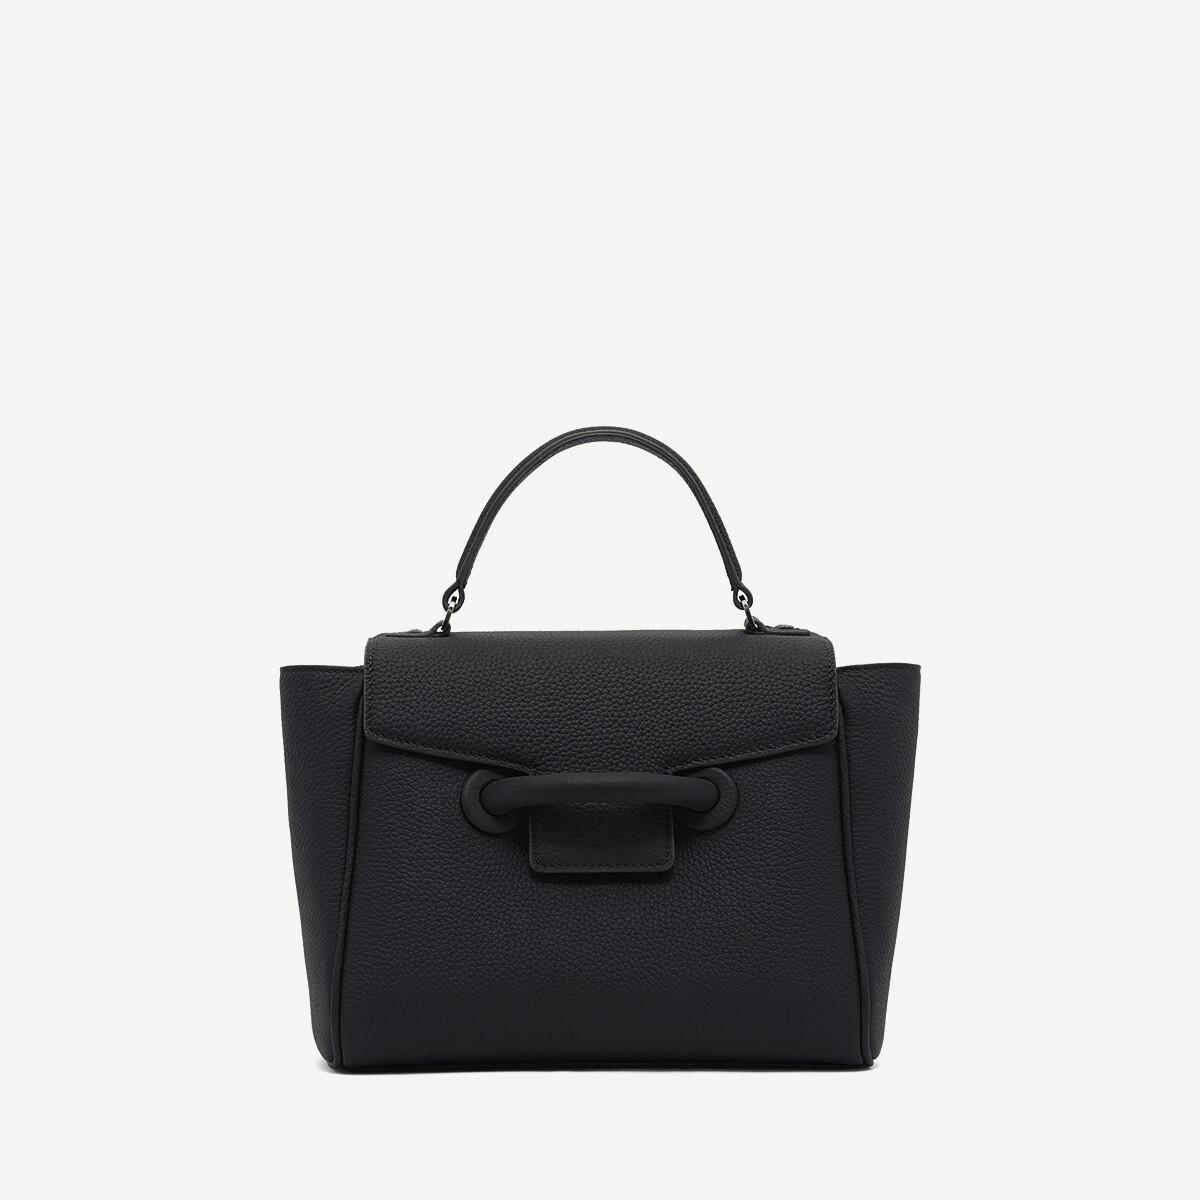 VASIC Ever mini / Black